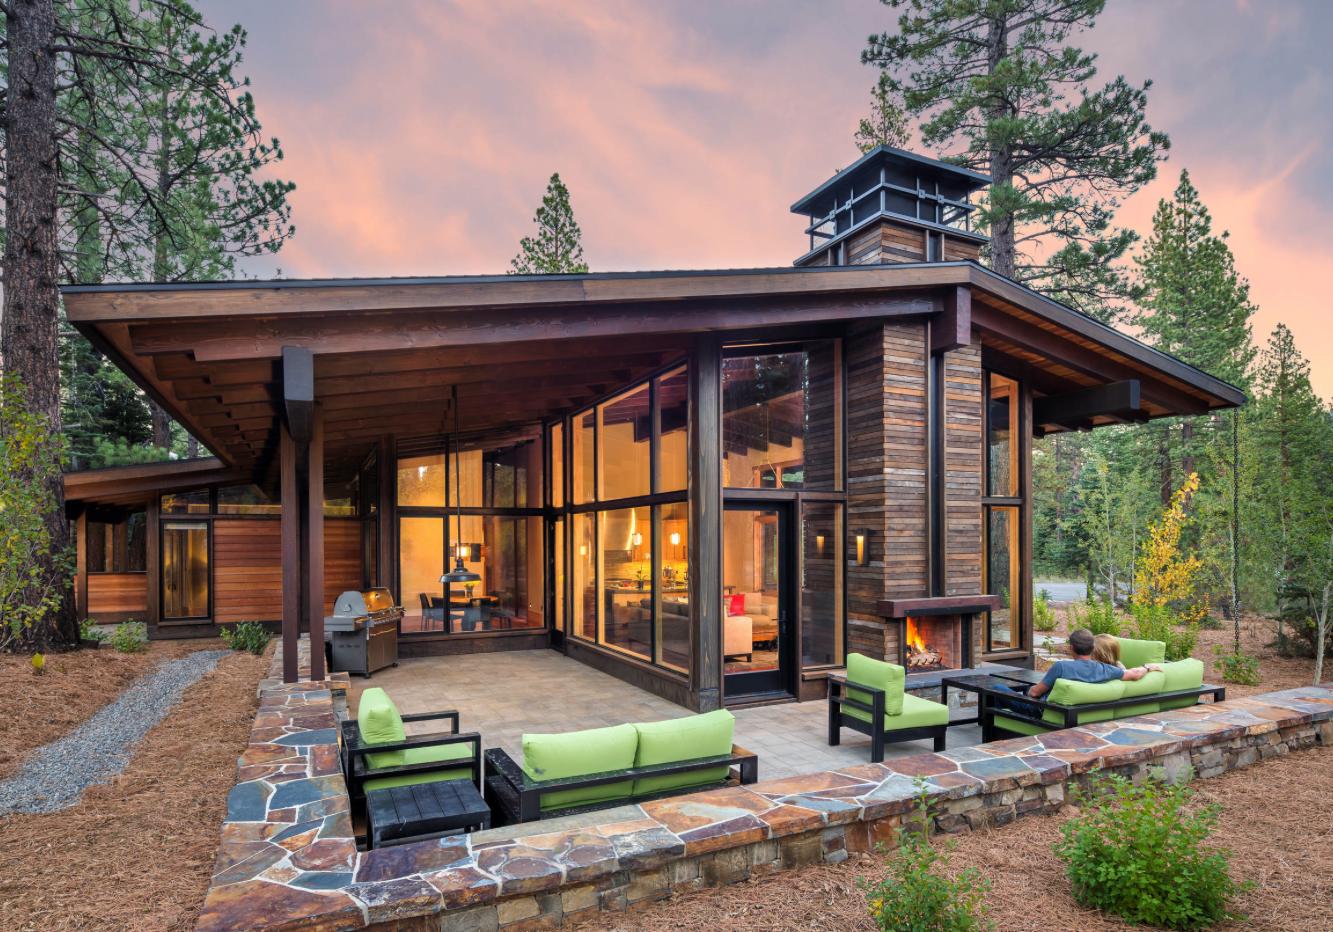 3f7ac5e229d09b4f6371bd84d381a551.png (PNG Image, 1333 × 932 pixels) -  Scaled (92%)   House exterior, House design, Modern house design